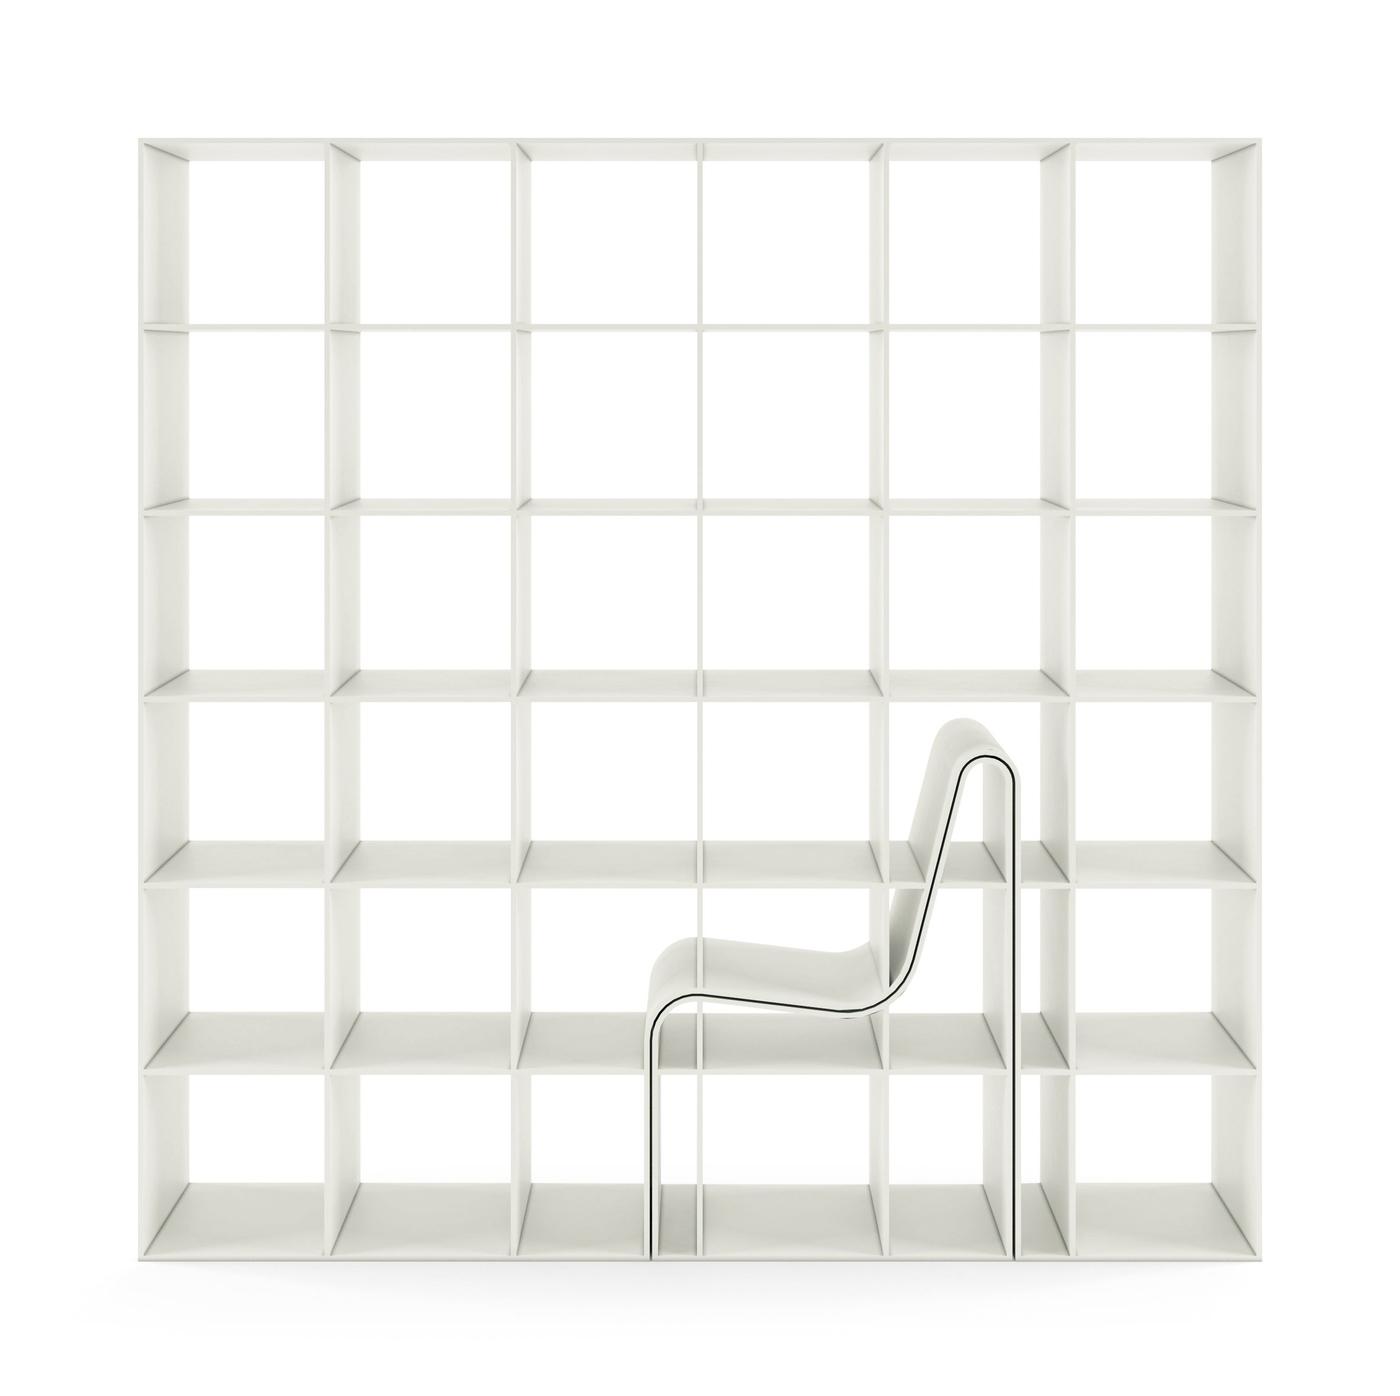 bookchair-sou-fujimoto-design-interiors_dezeen_2364_col_4.jpg